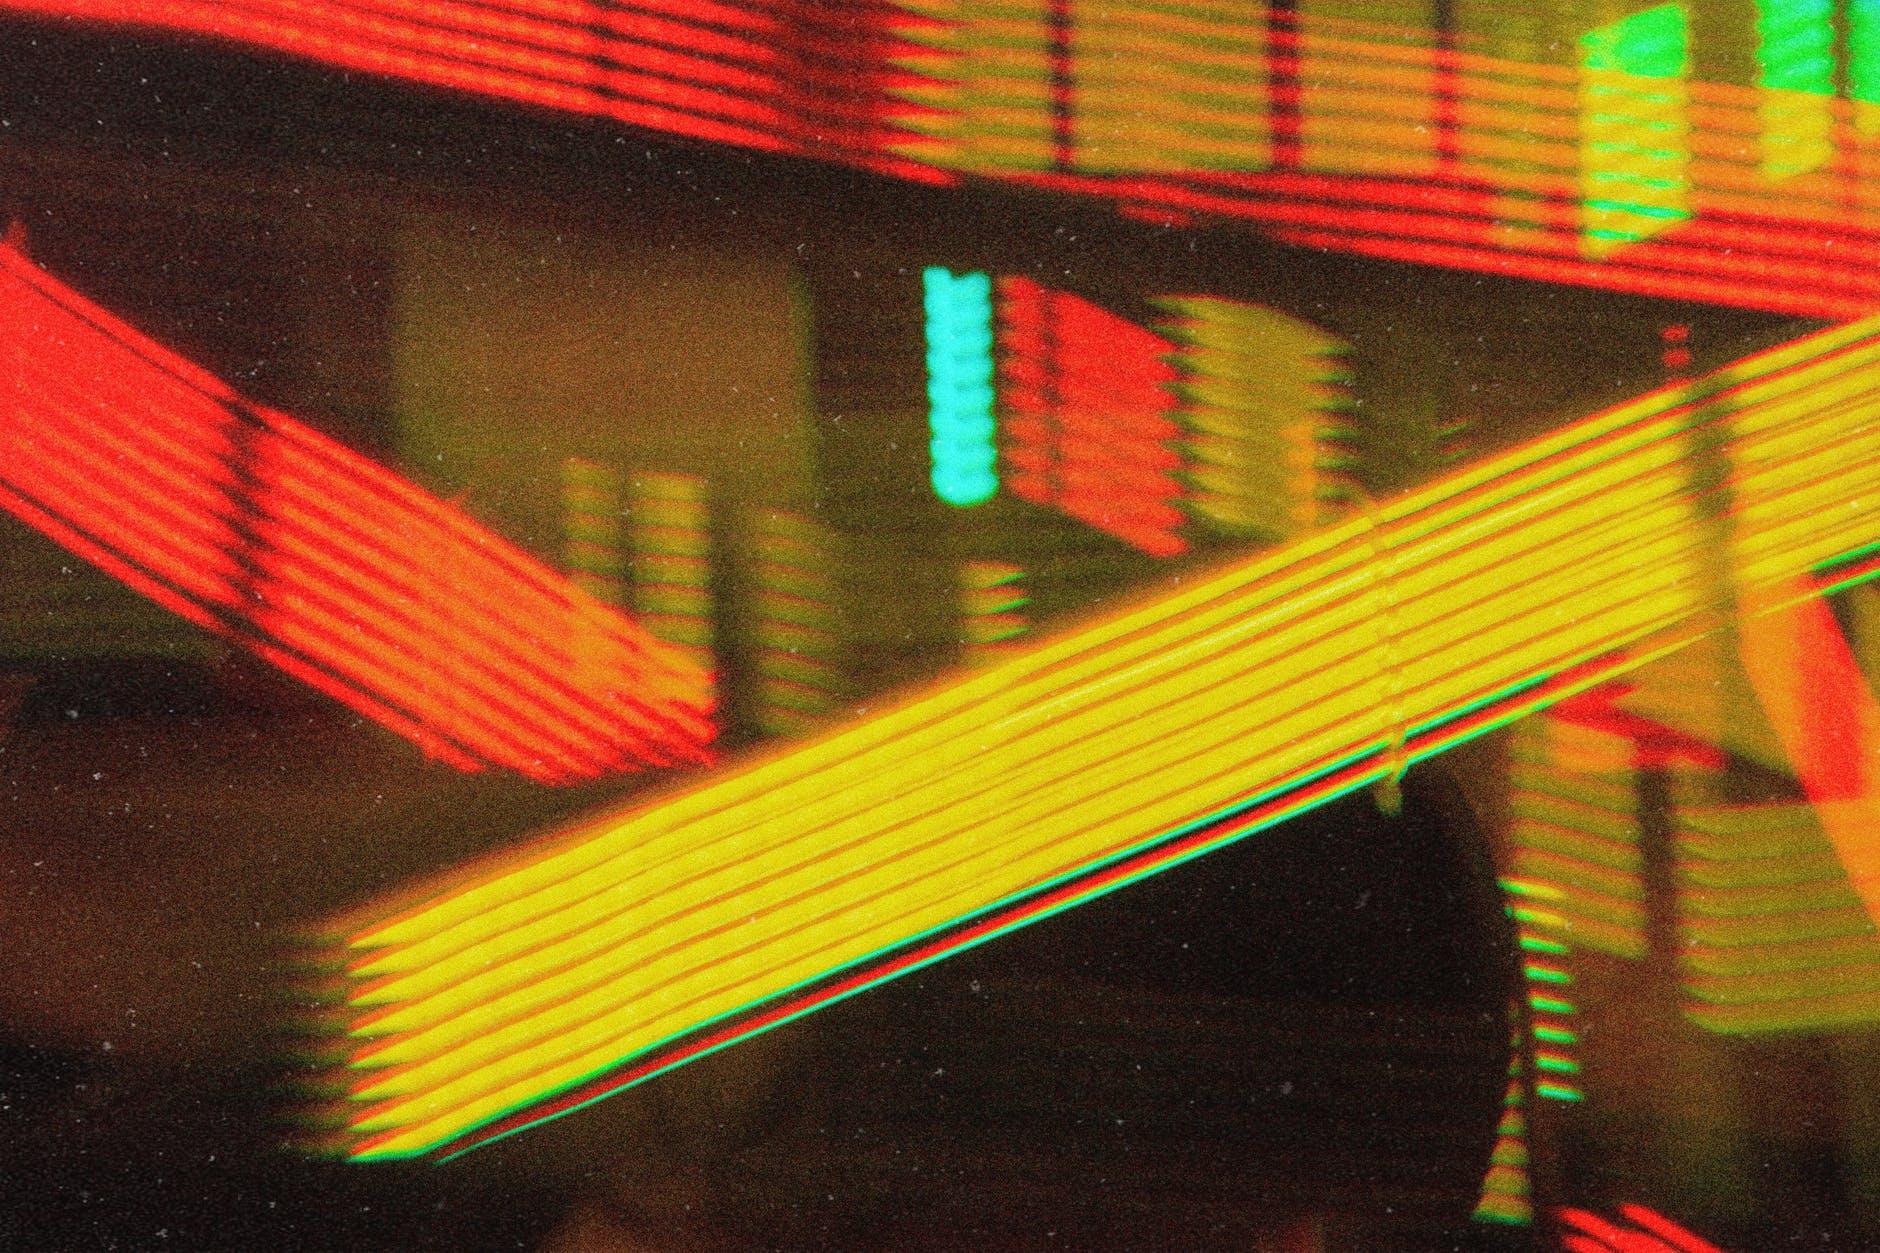 orange and yellow neon lights